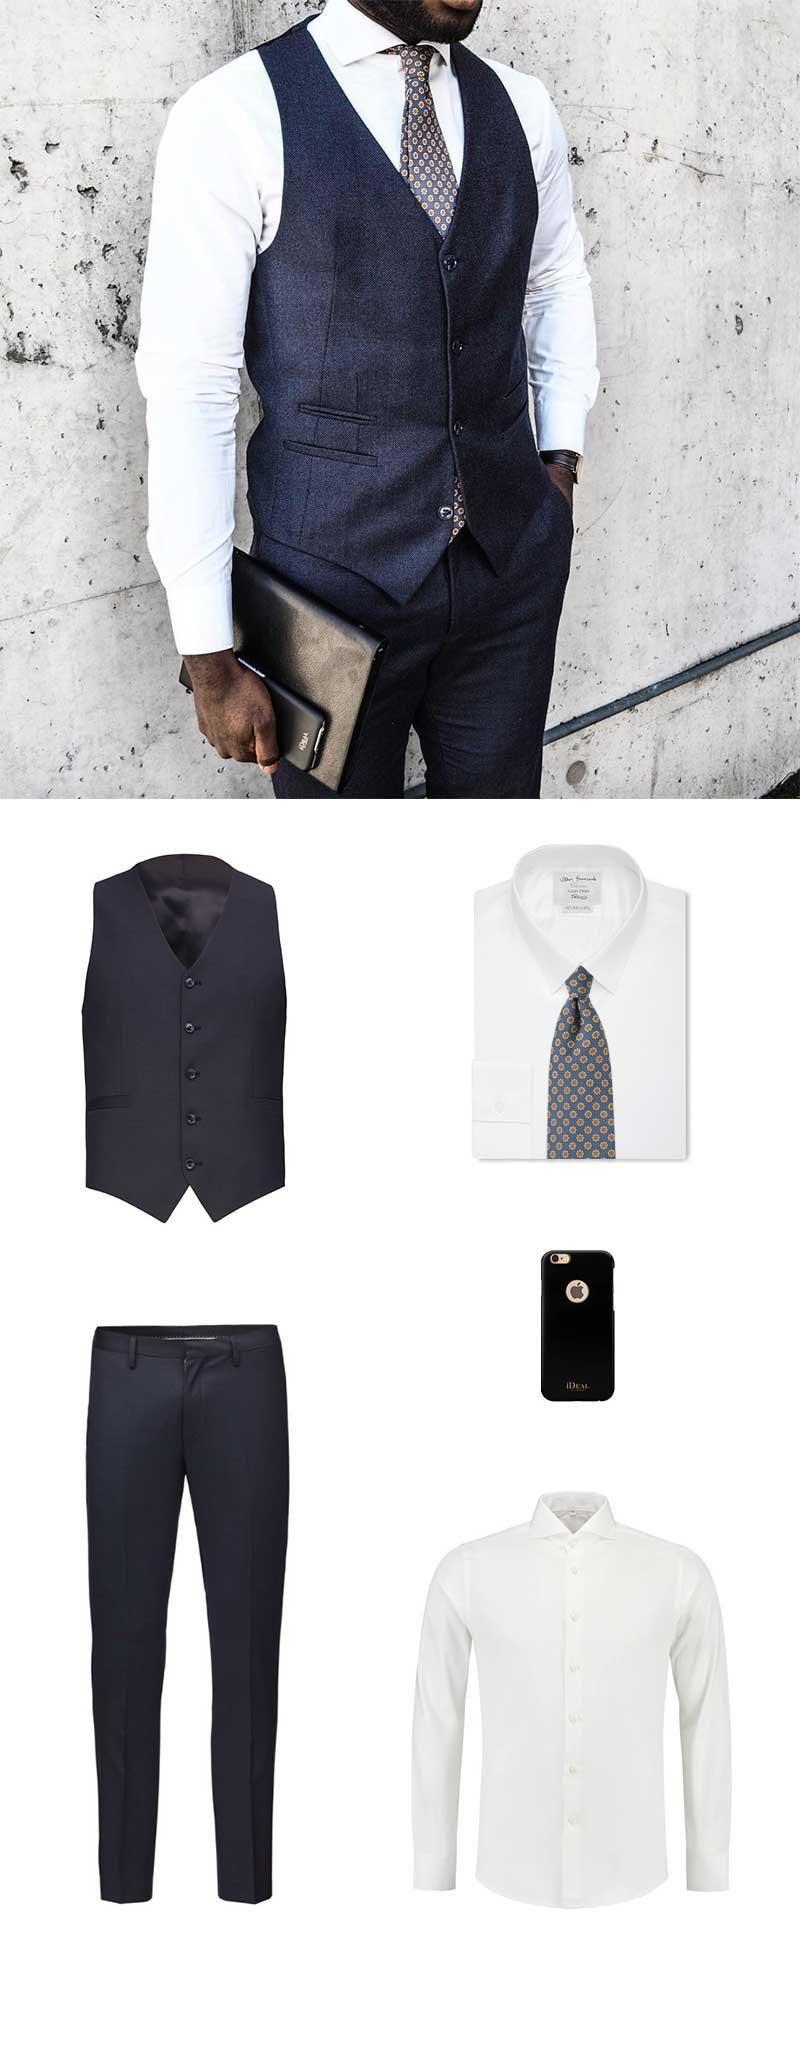 Vintage Tie and Vest